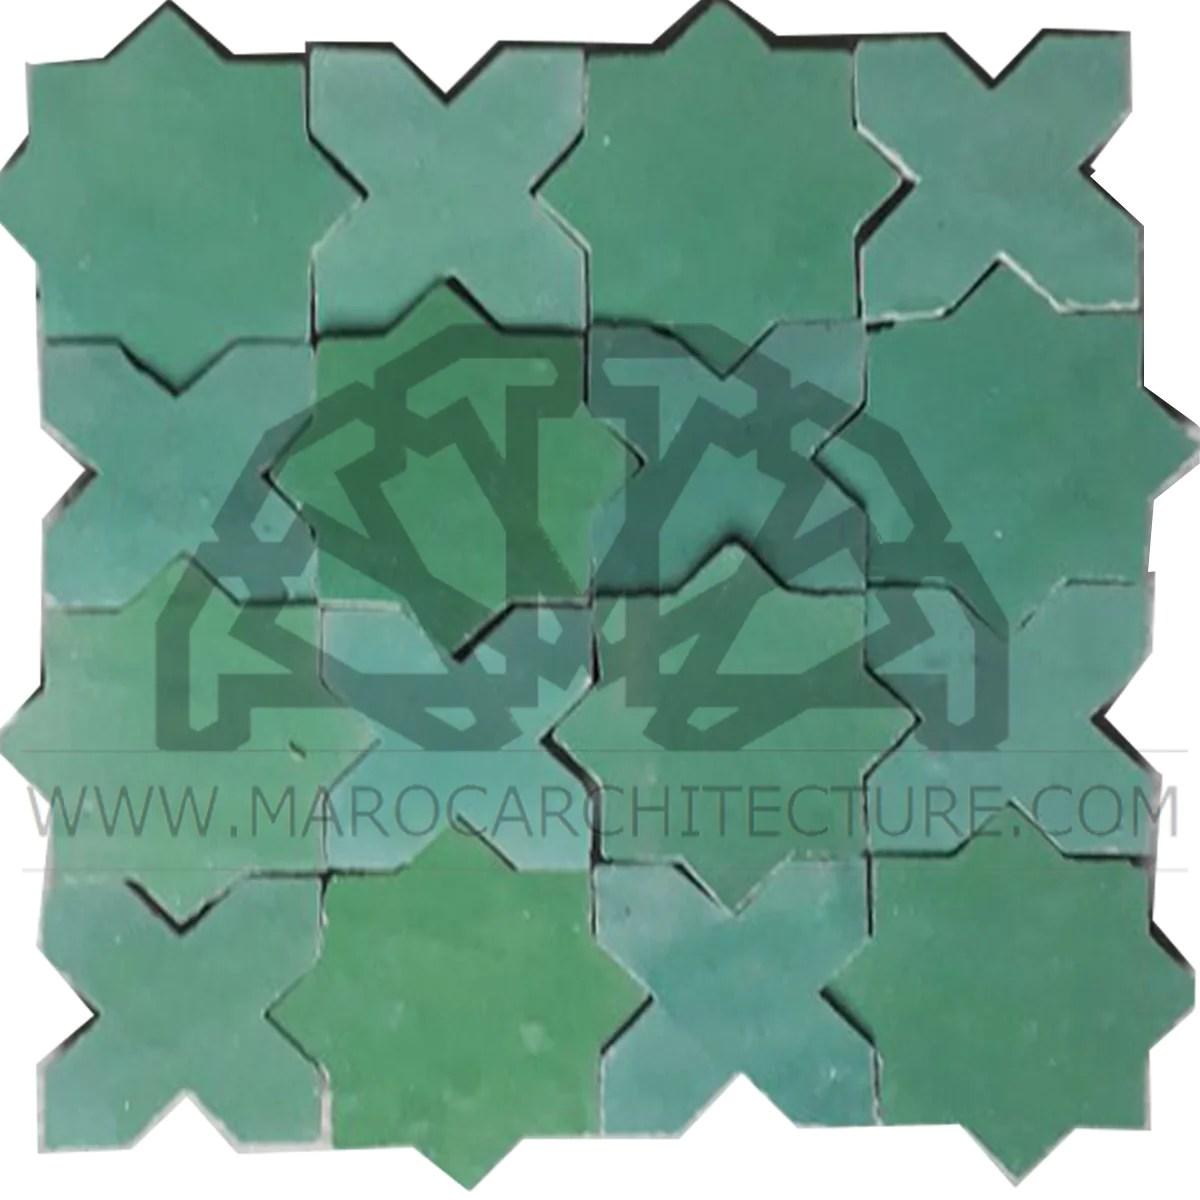 star and cross zellij tile maroc architecture